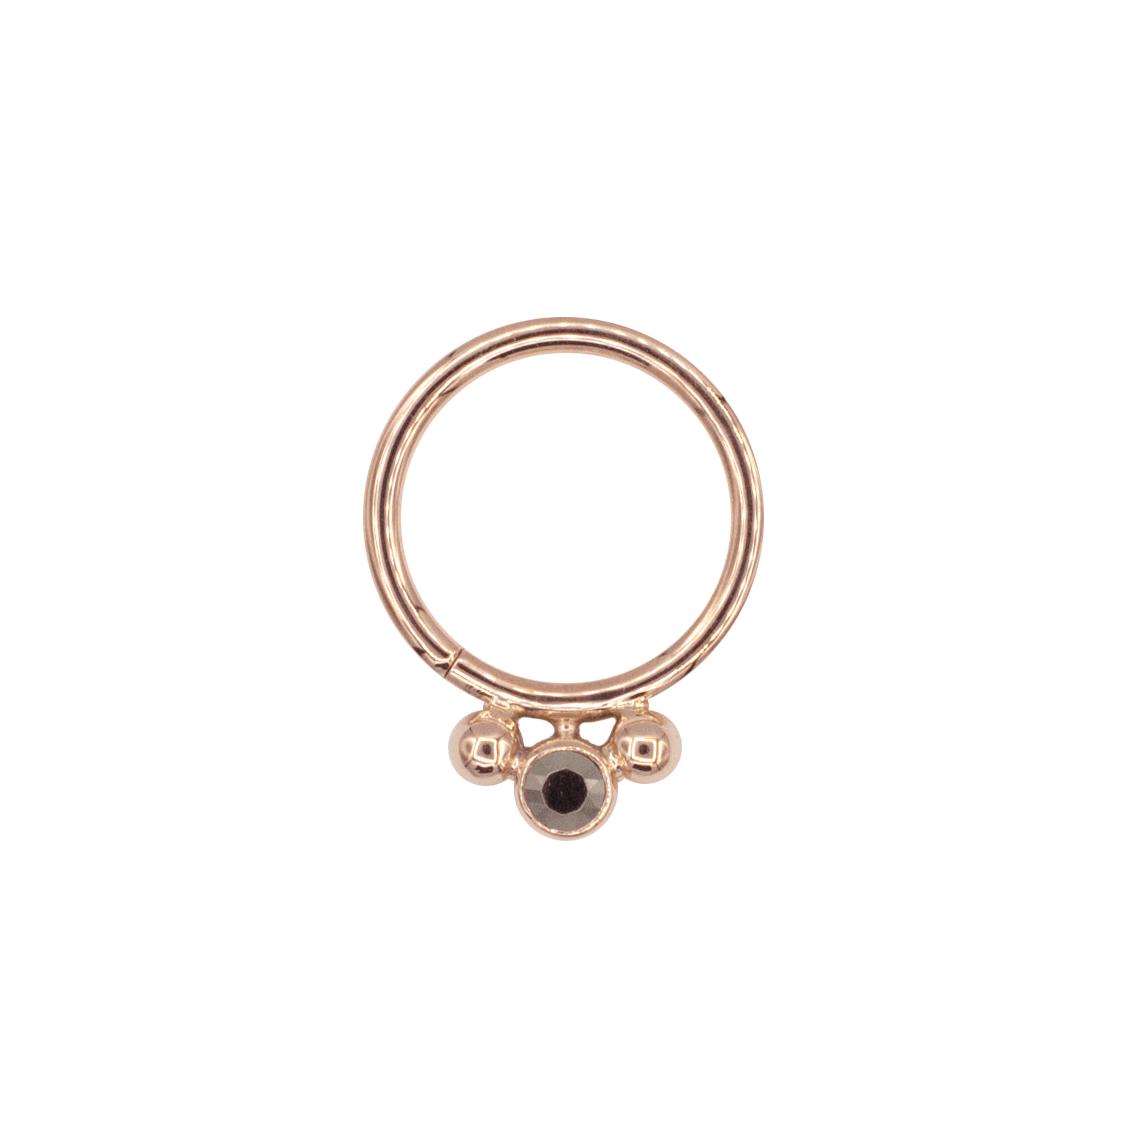 oberon seam ring with